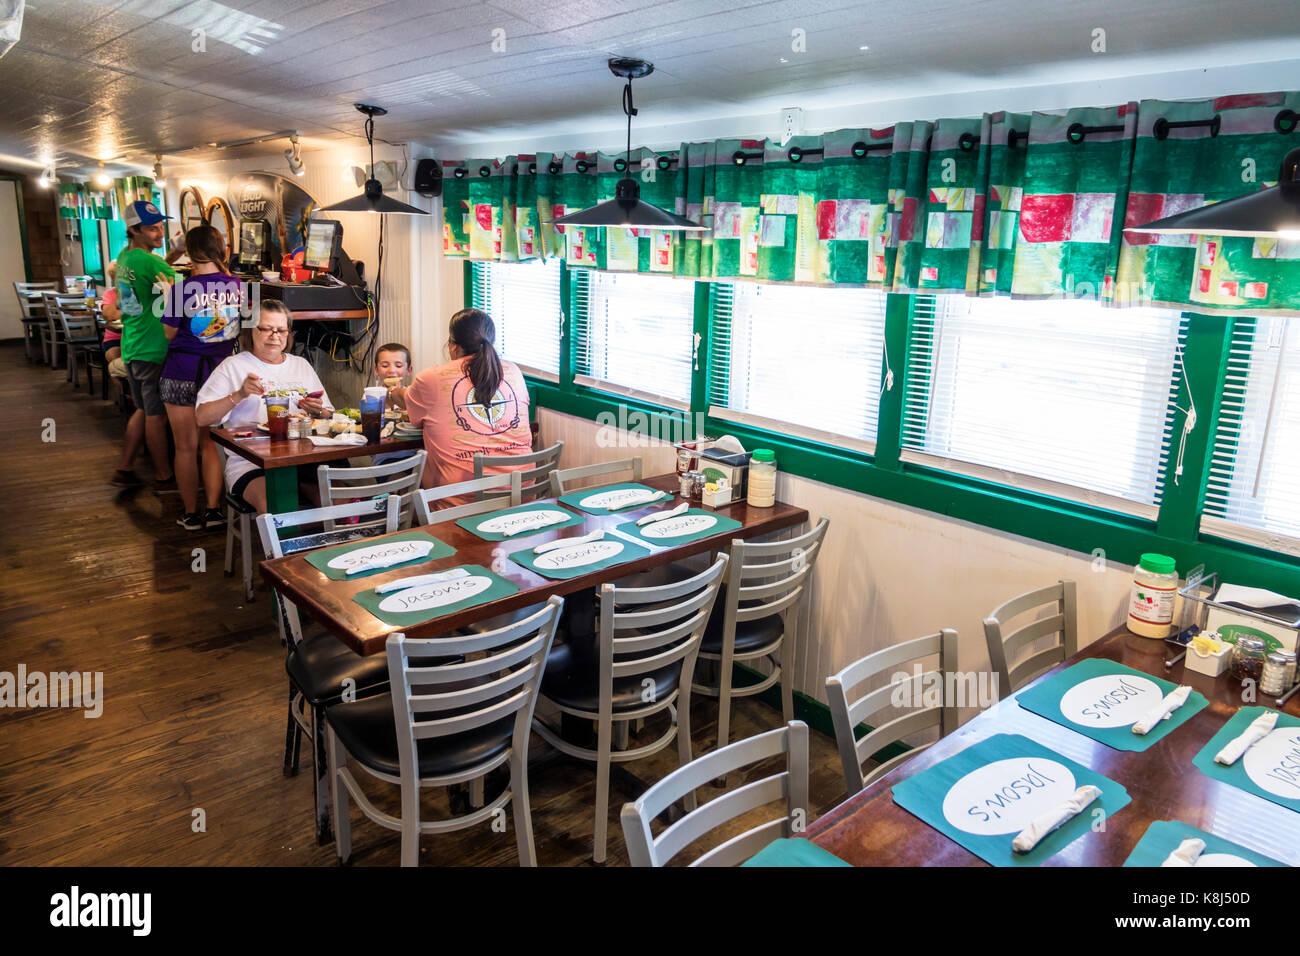 Outer Banks North Carolina NC Ocracoke Island Jason's Restaurant seafood table family dining - Stock Image